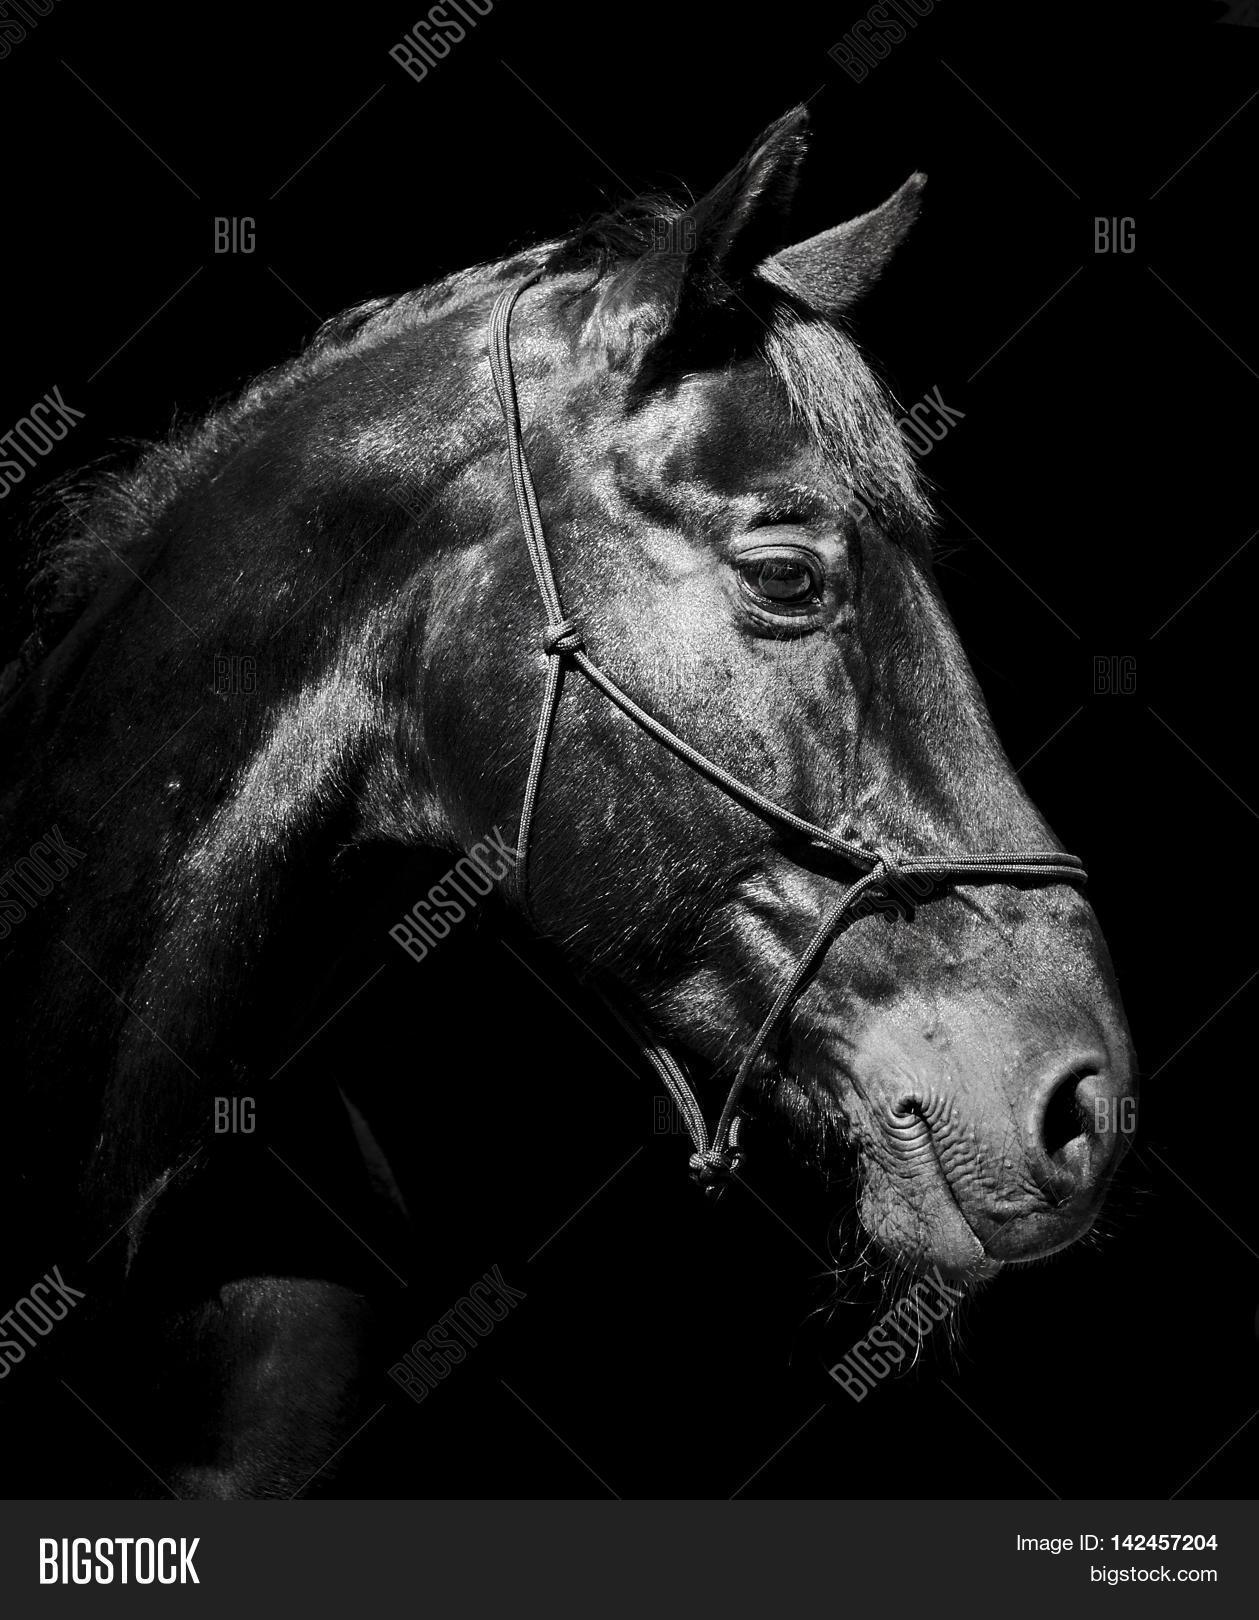 Black Horse Halter Image Photo Free Trial Bigstock